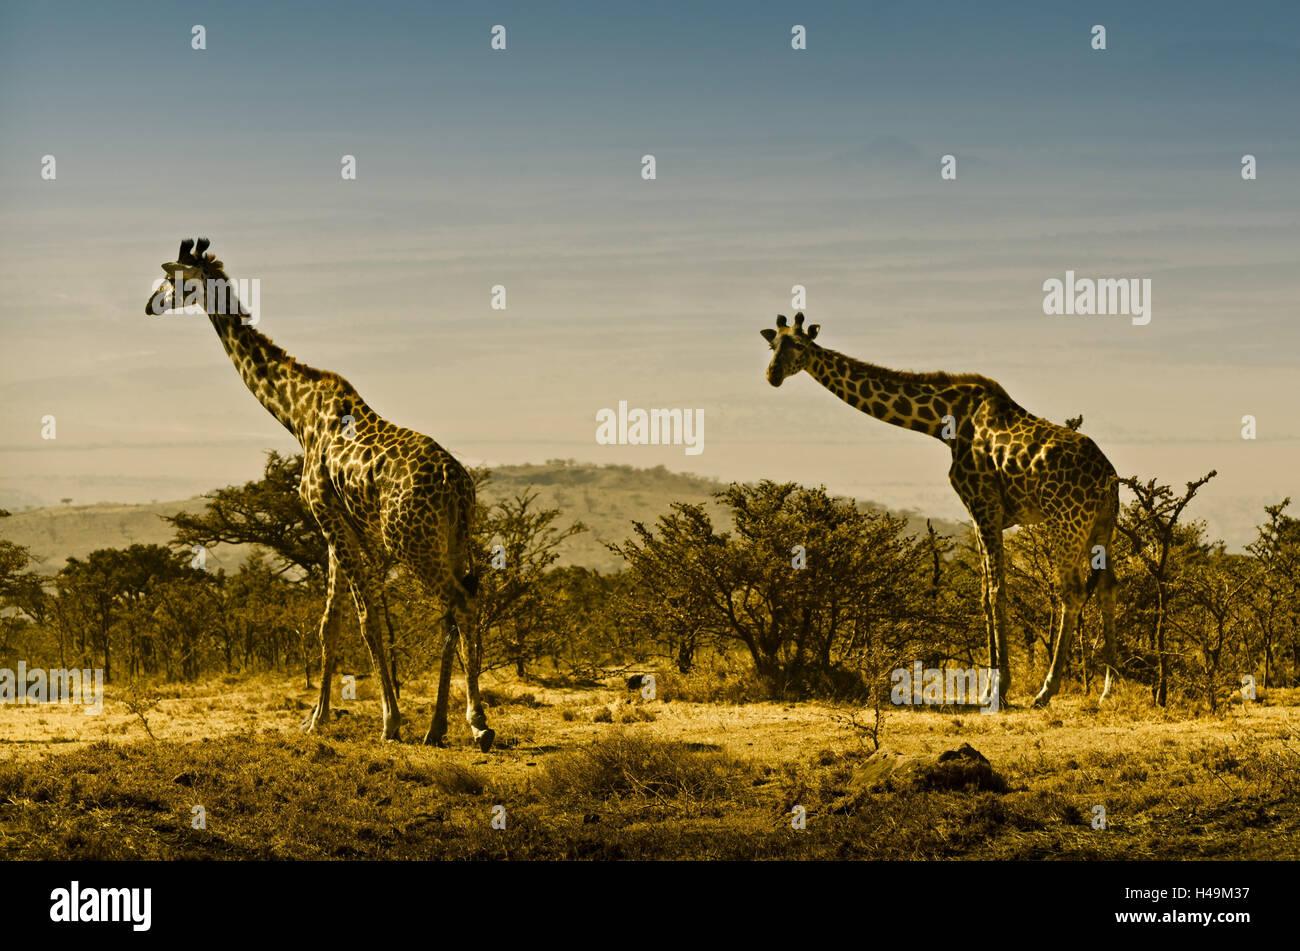 Africa, Tanzania, East Africa, Serengeti, National Park, giraffe, - Stock Image